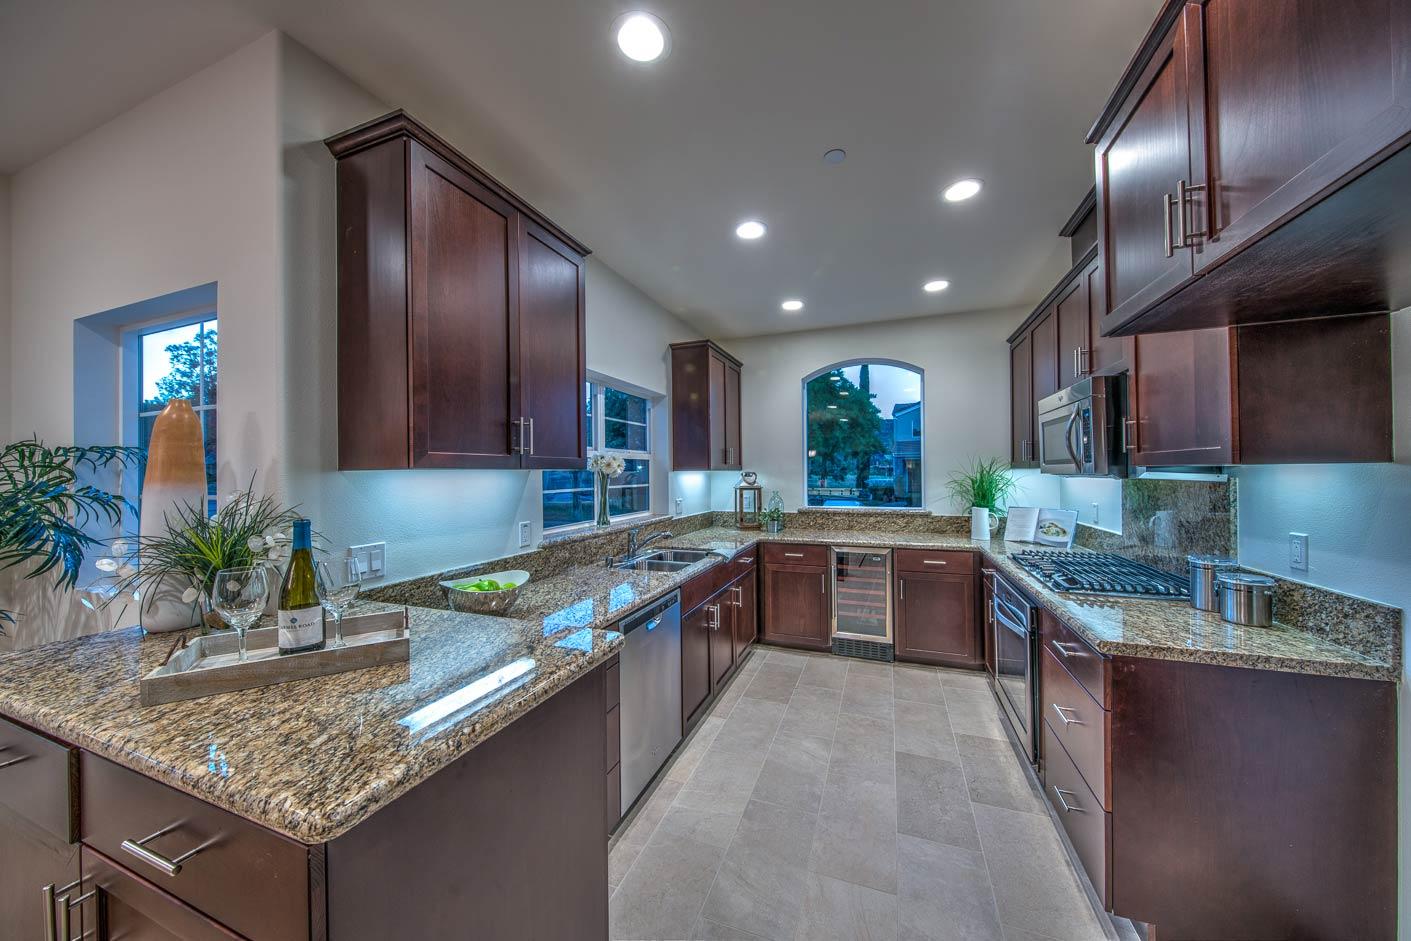 Bear Creek Villas, Murrieta Kitchen